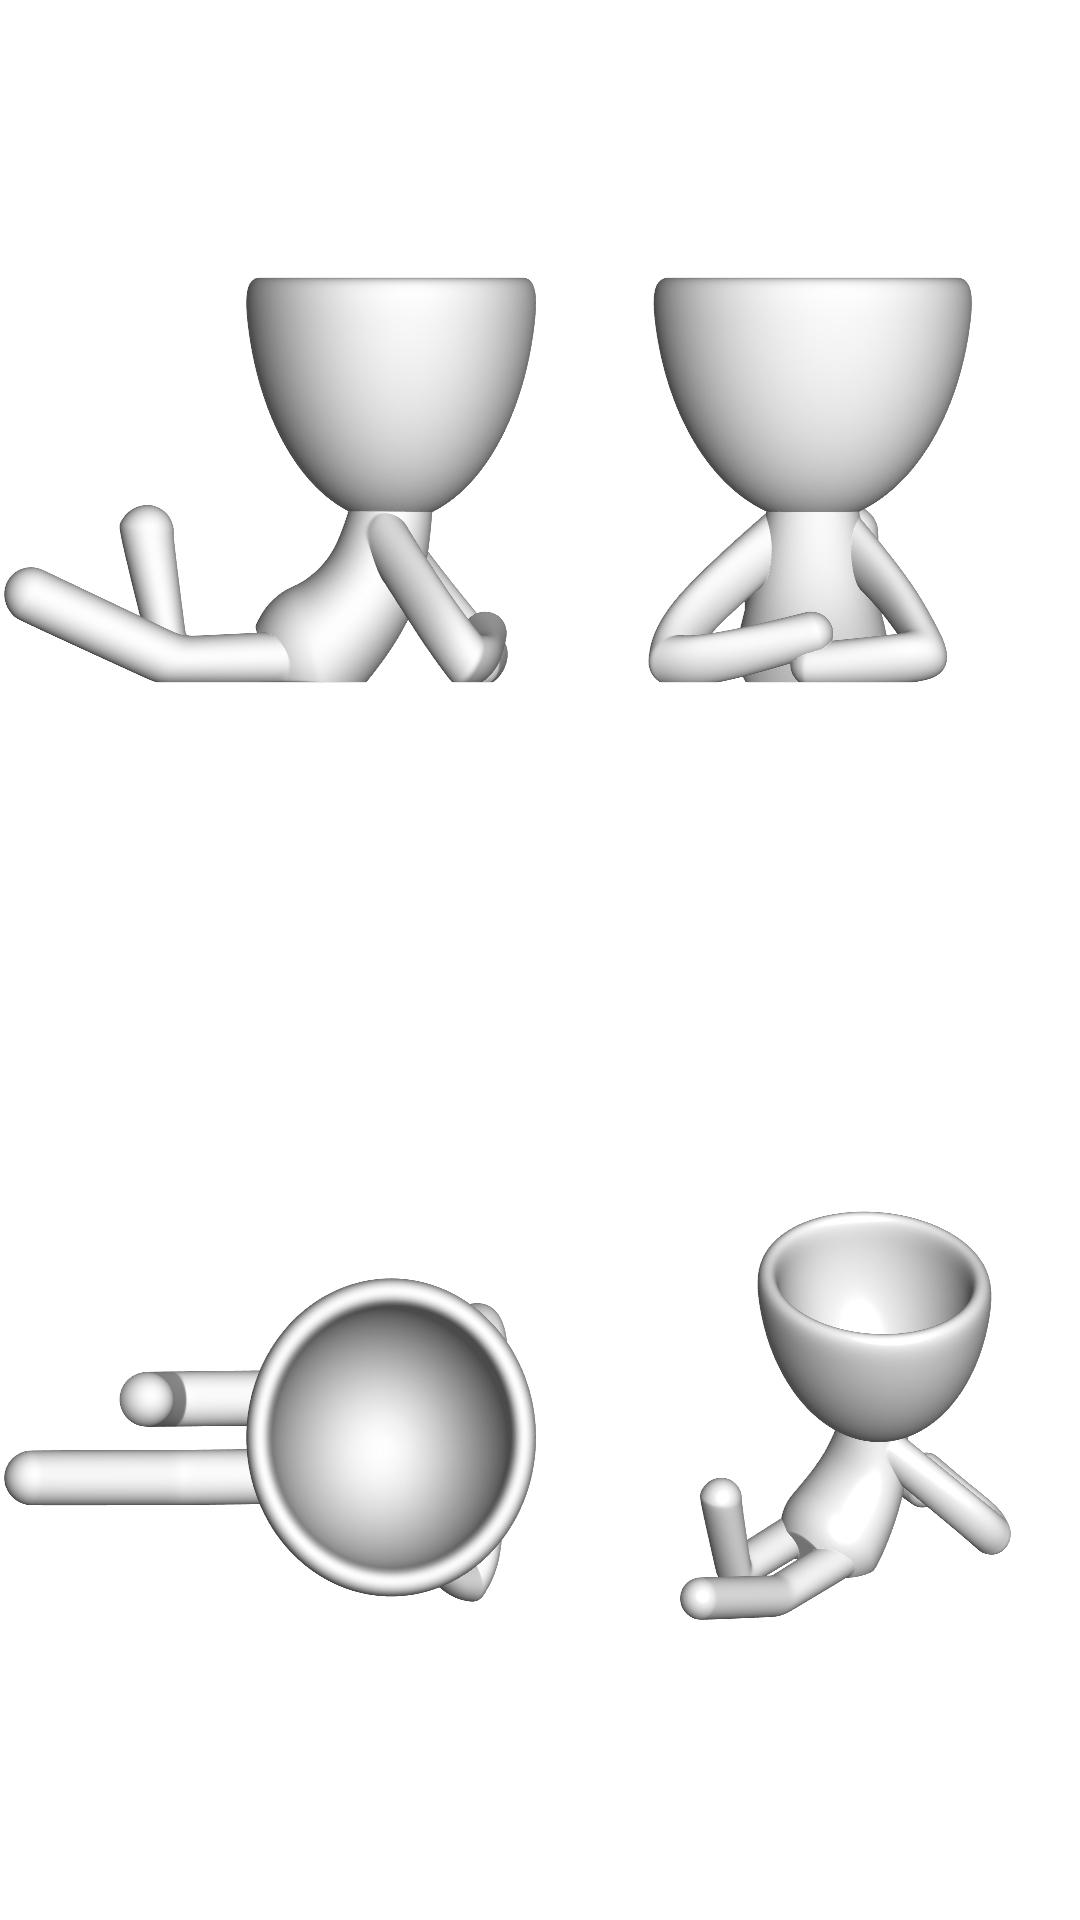 Vaso_02_Blanco_2.jpg Download free STL file JARRÓN MACETA ROBERT 02 - VASE FLOWERPOT ROBERT 02 • 3D print model, PRODUSTL56